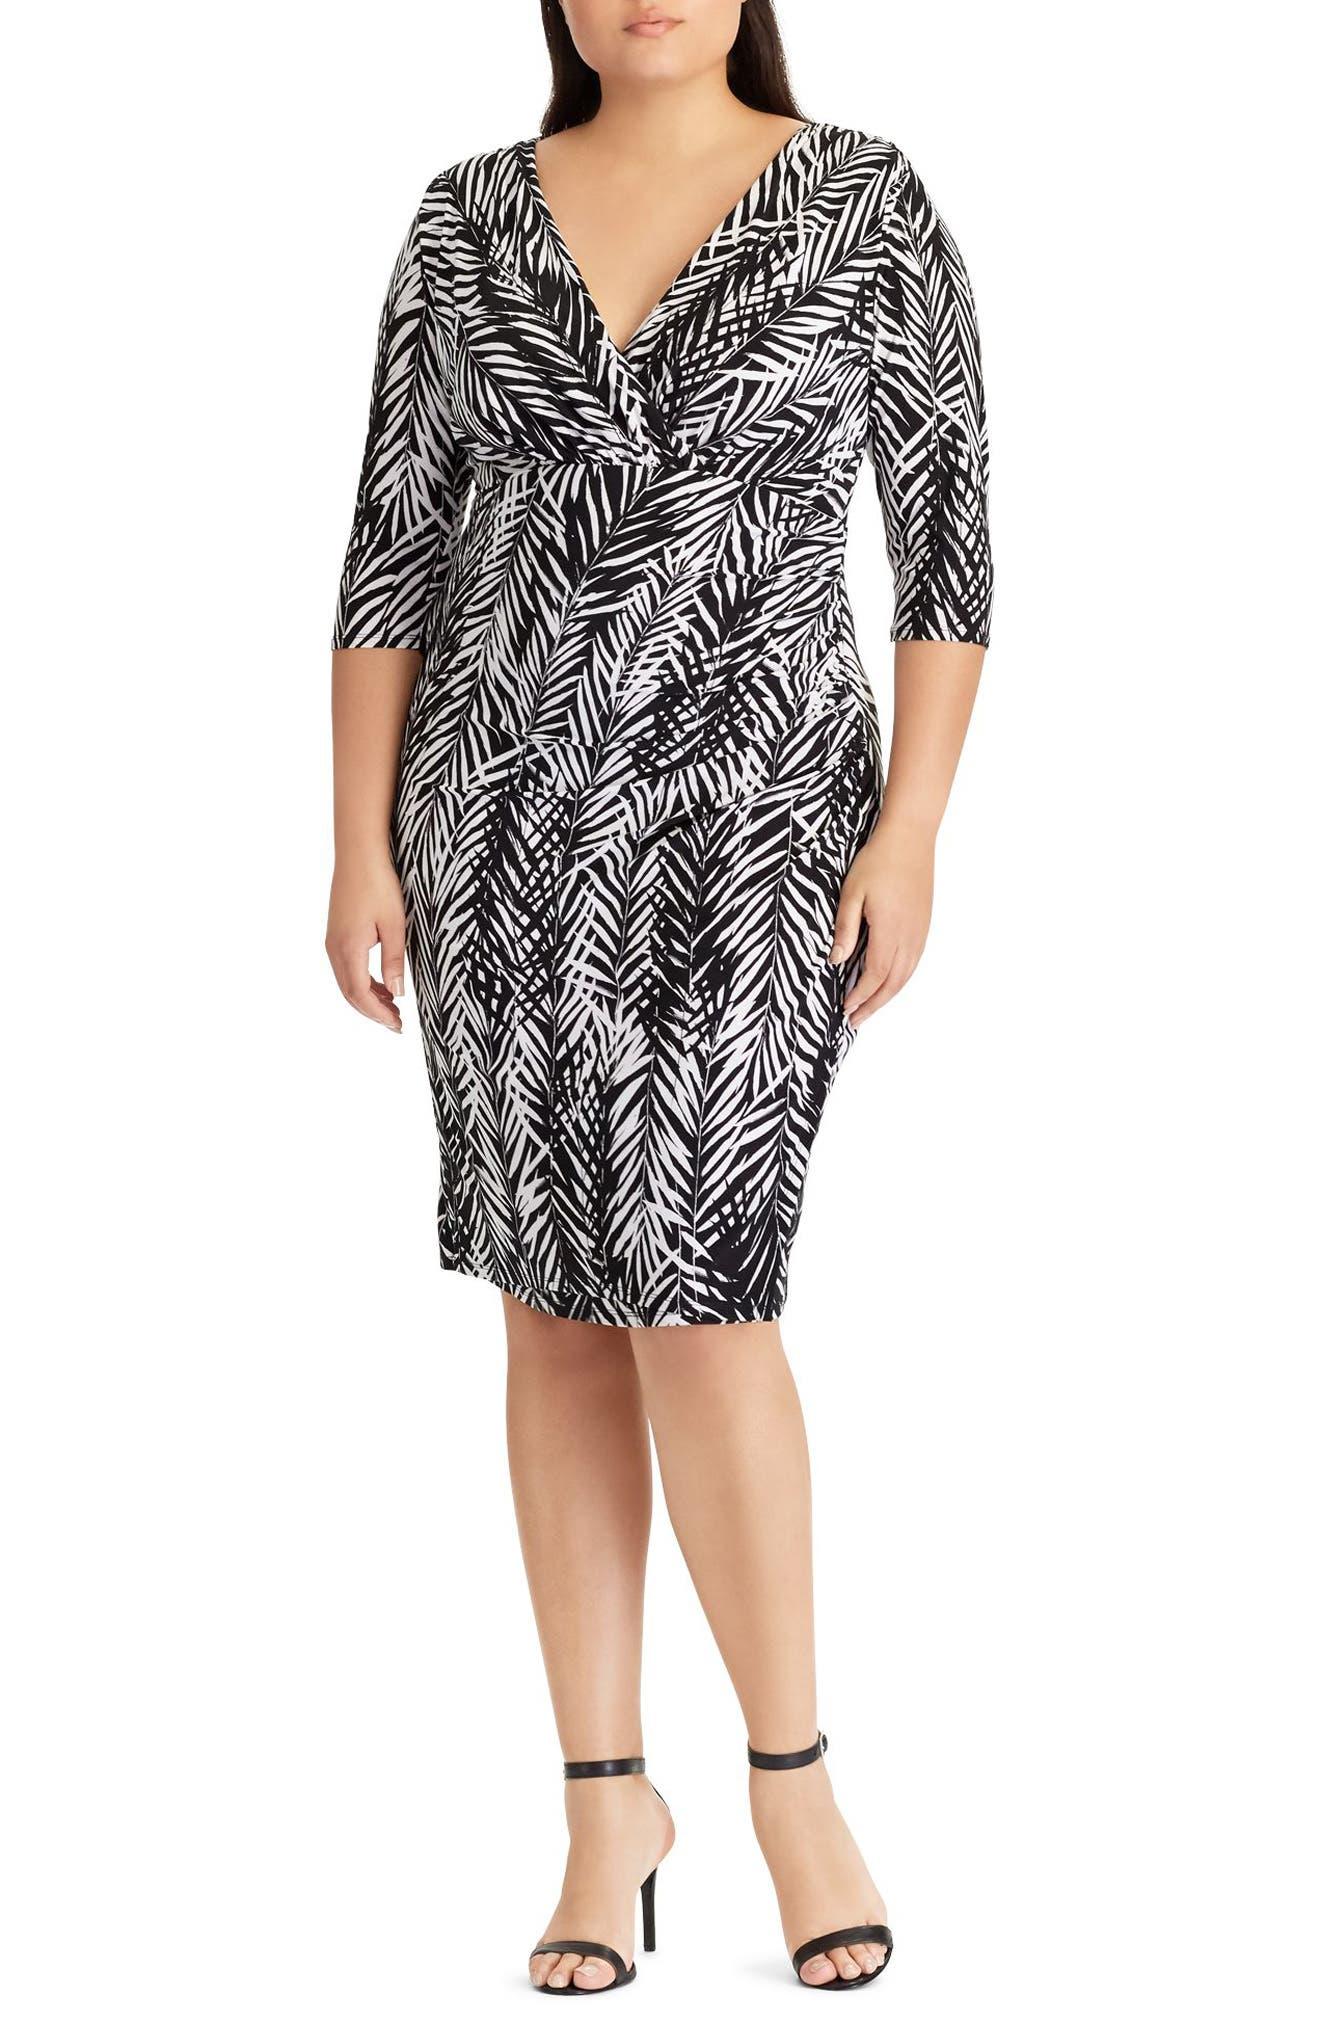 Zebra Twigs Sheath Dress,                             Main thumbnail 1, color,                             001